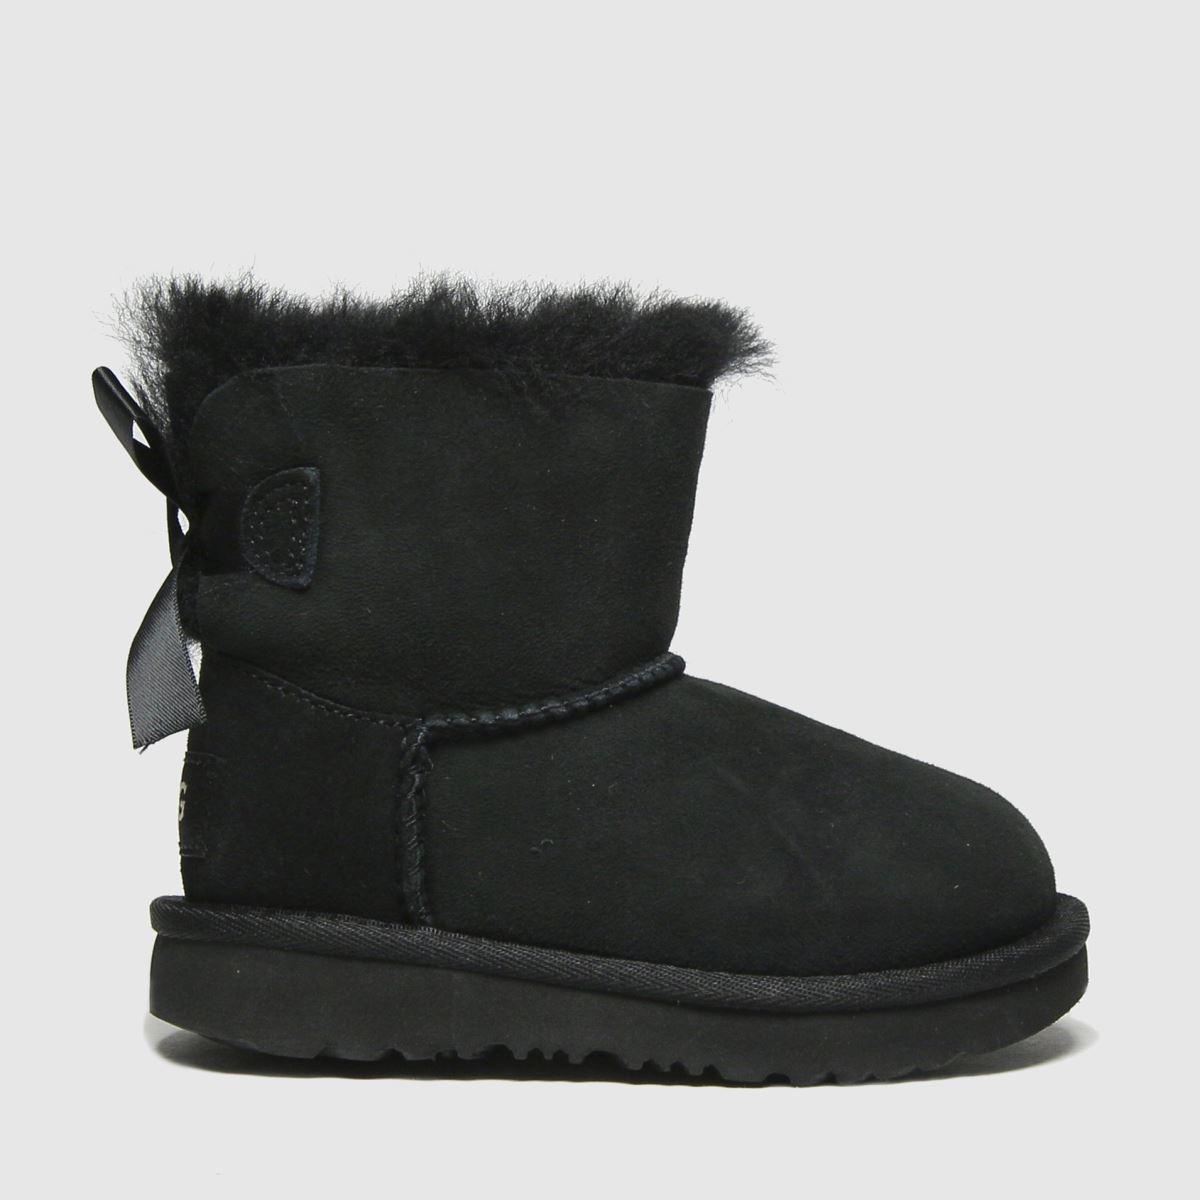 UGG Black Mini Bailey Bow Ii Boots Toddler